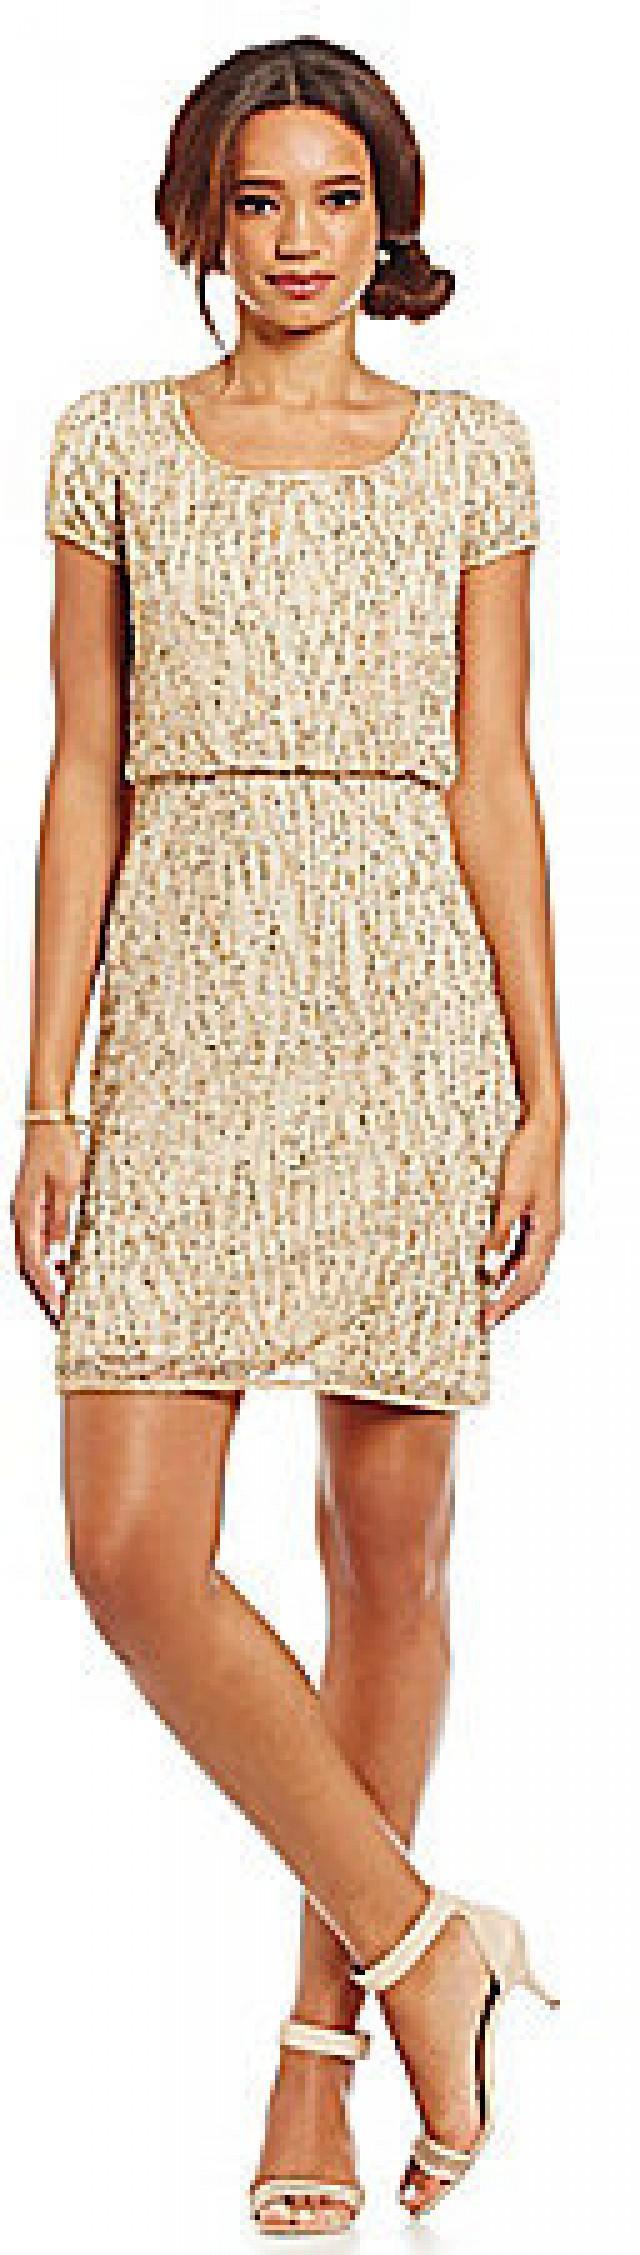 Adrianna Papell Beaded Cap-Sleeve Cocktail Dress #2458029 - Weddbook